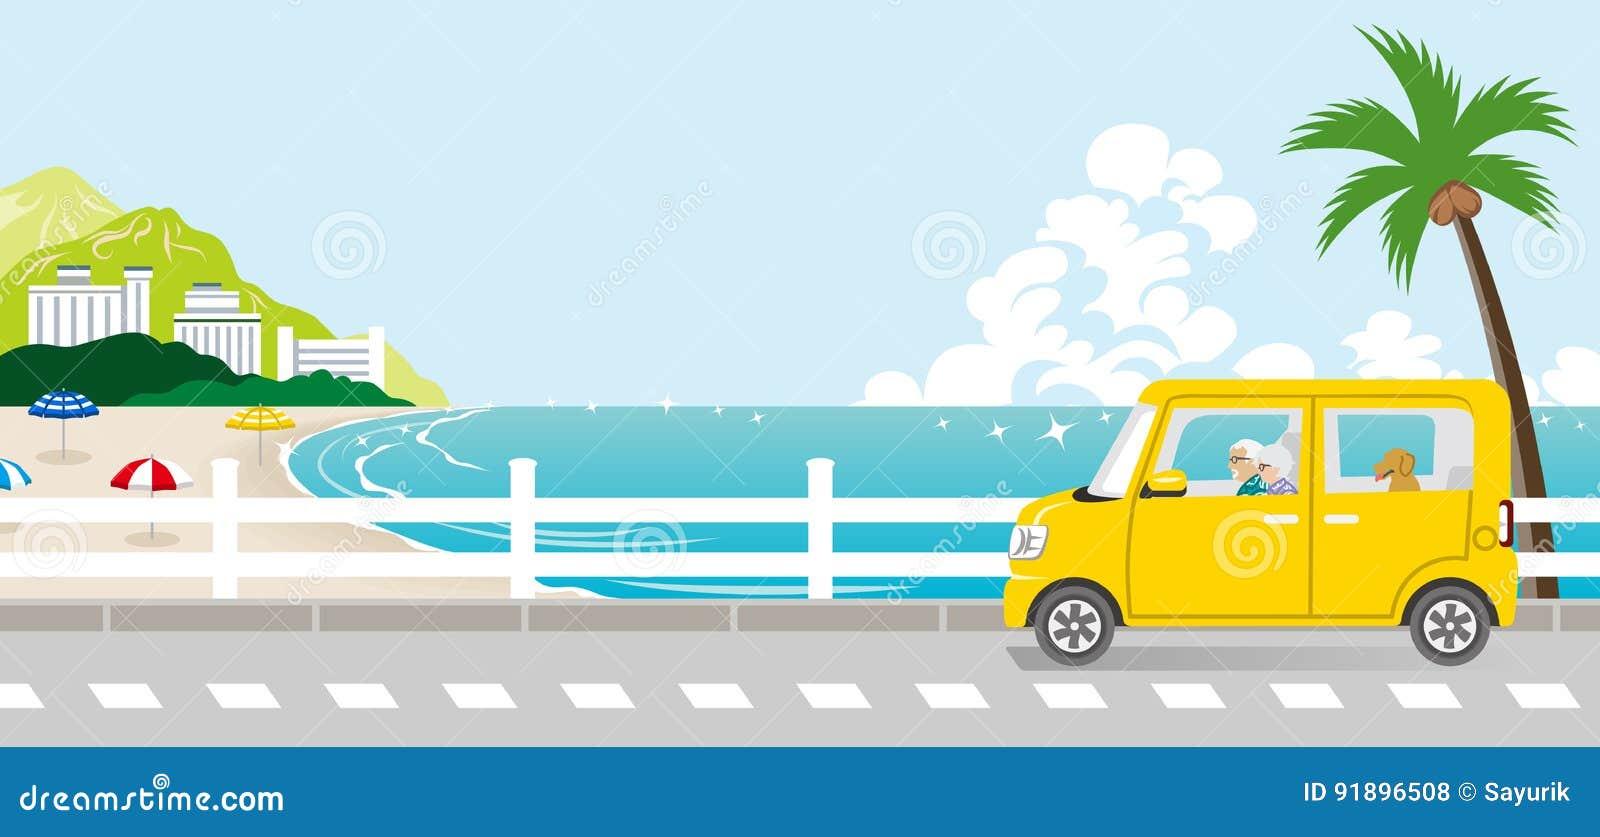 Summer drive in the Seaside street - Senior couple